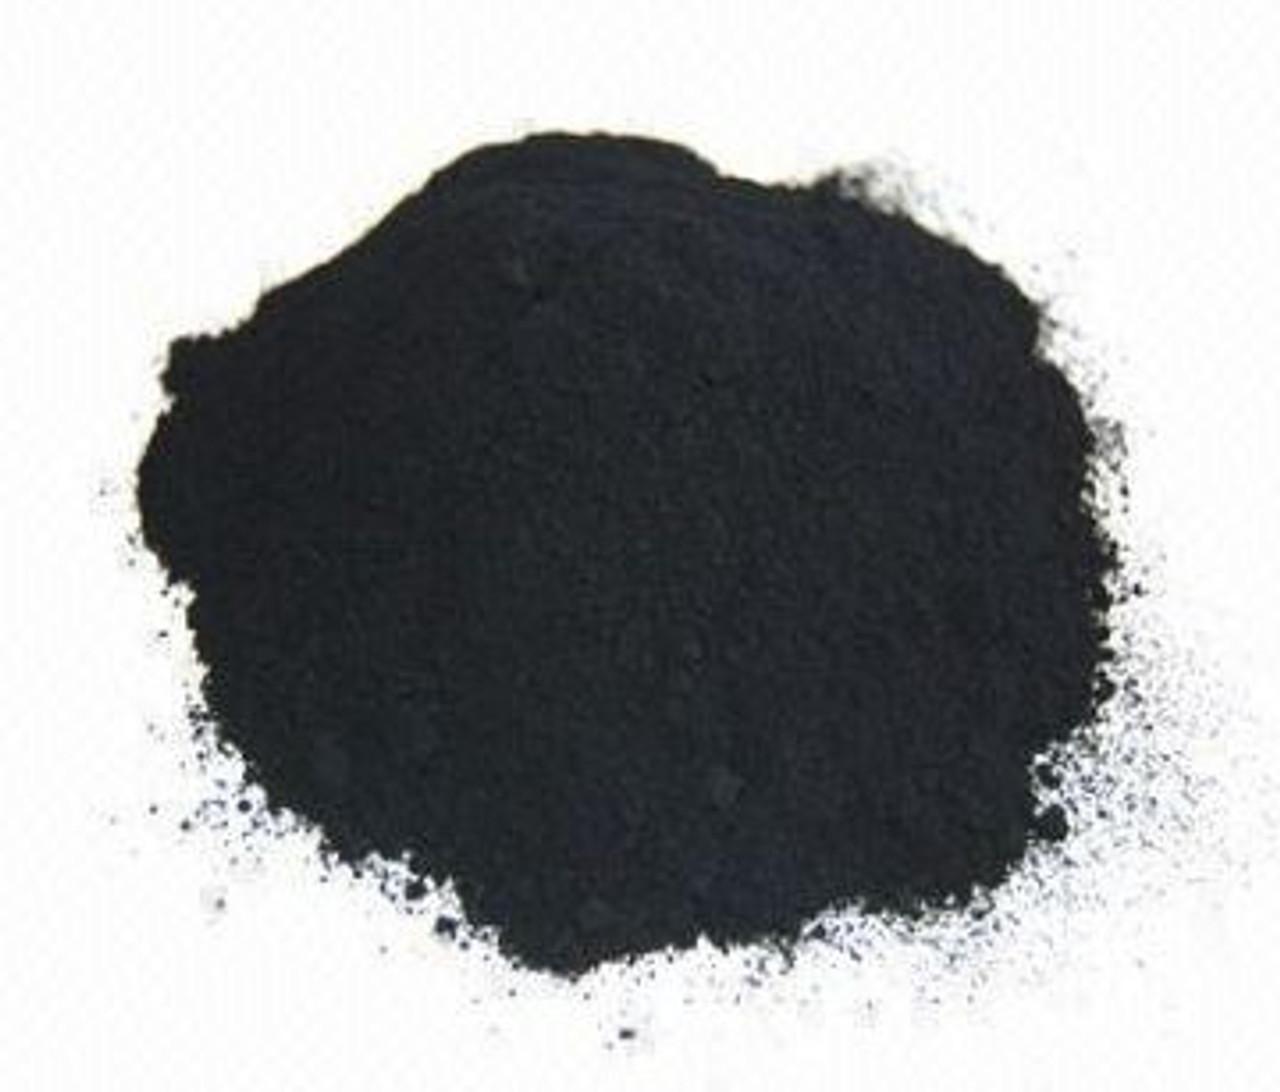 Tungsten Disulfide (WS2) Powder, 0.6 micron